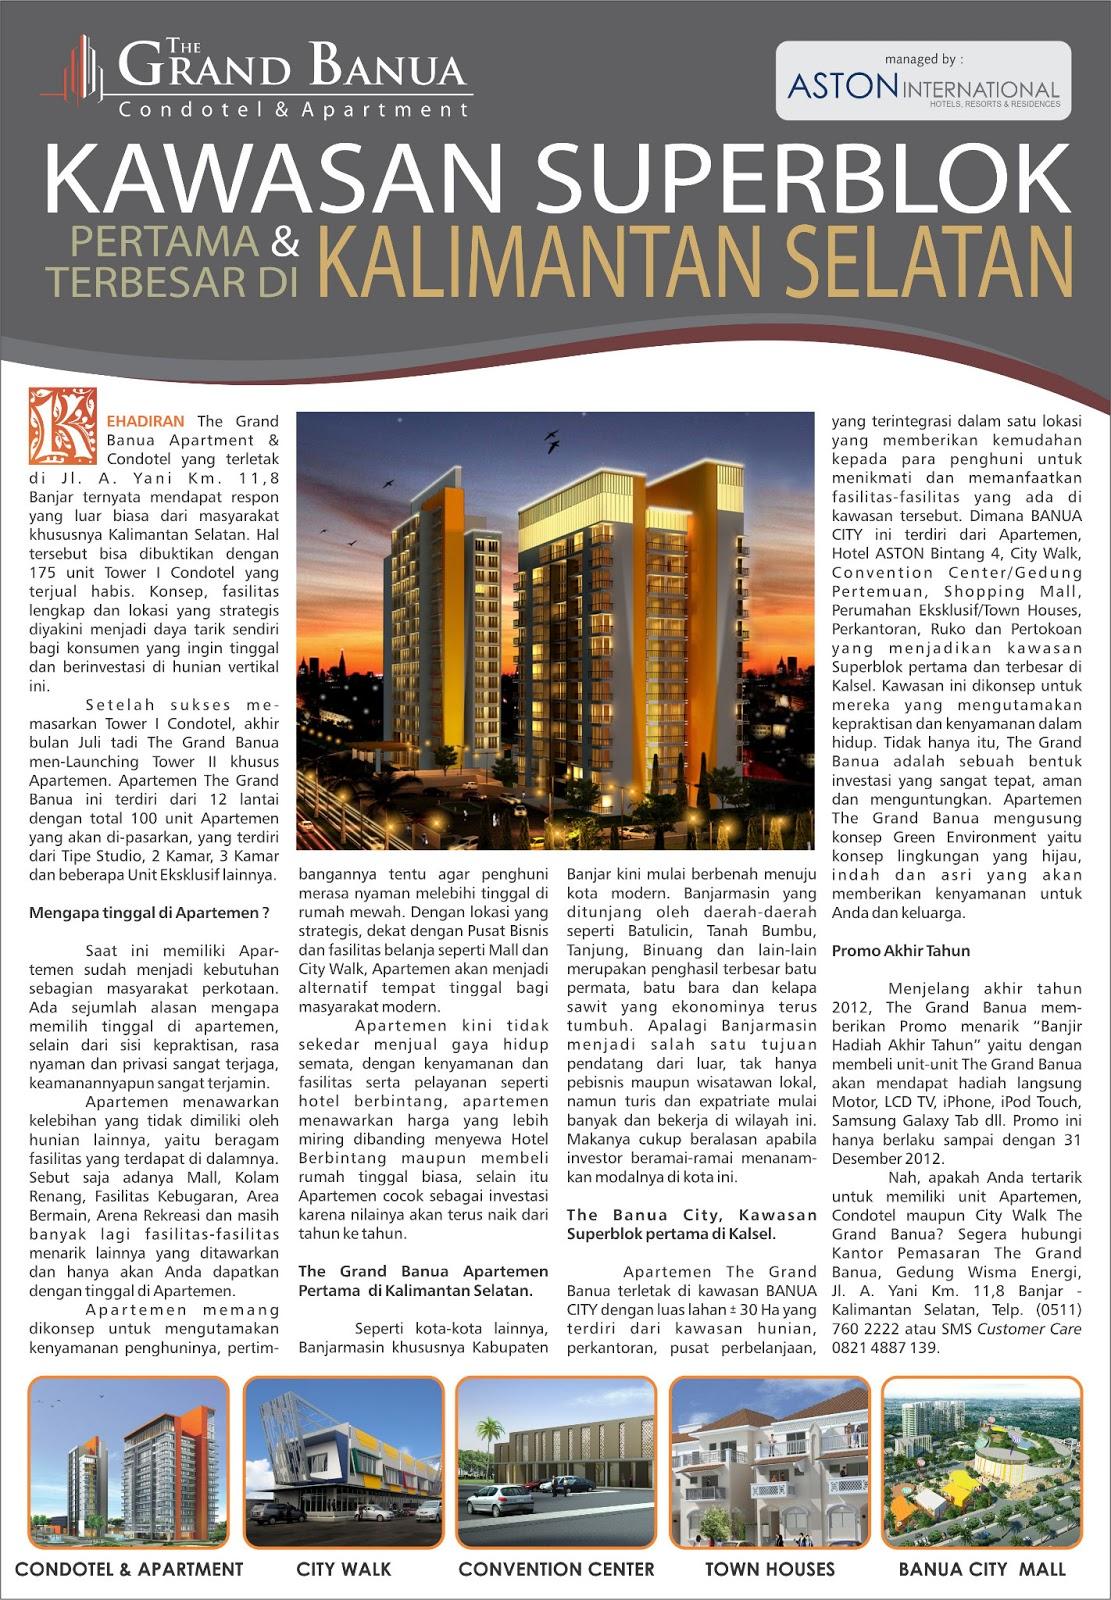 Grand Banua Kawasan Superblok Terbesar Kalimantan Selatan